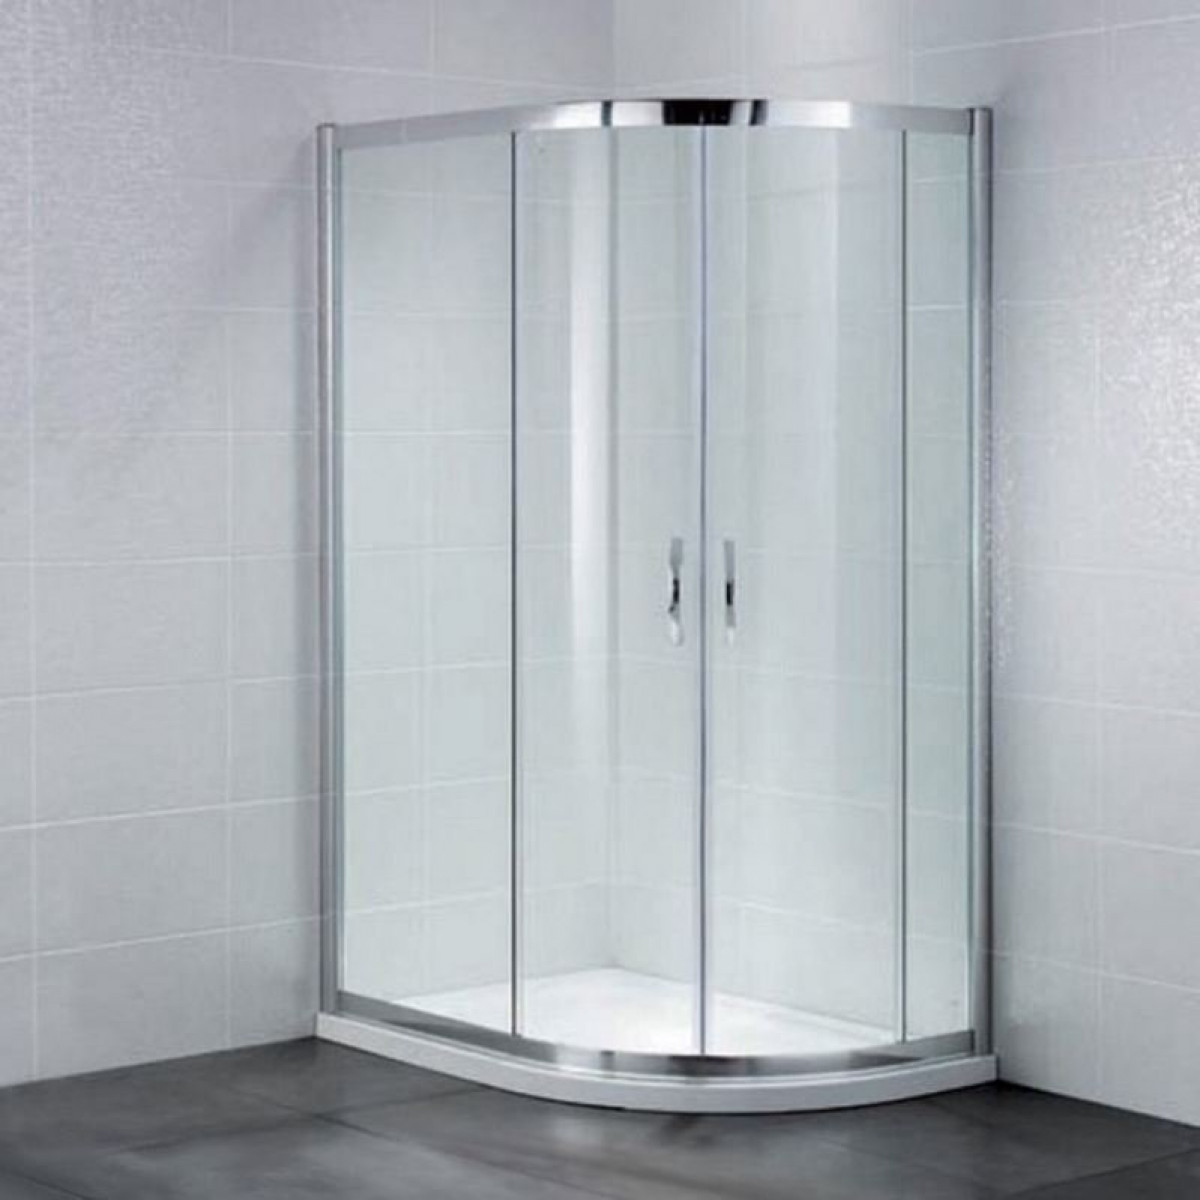 900mm x 760/800mm Offset Quadrant Shower Enclosures